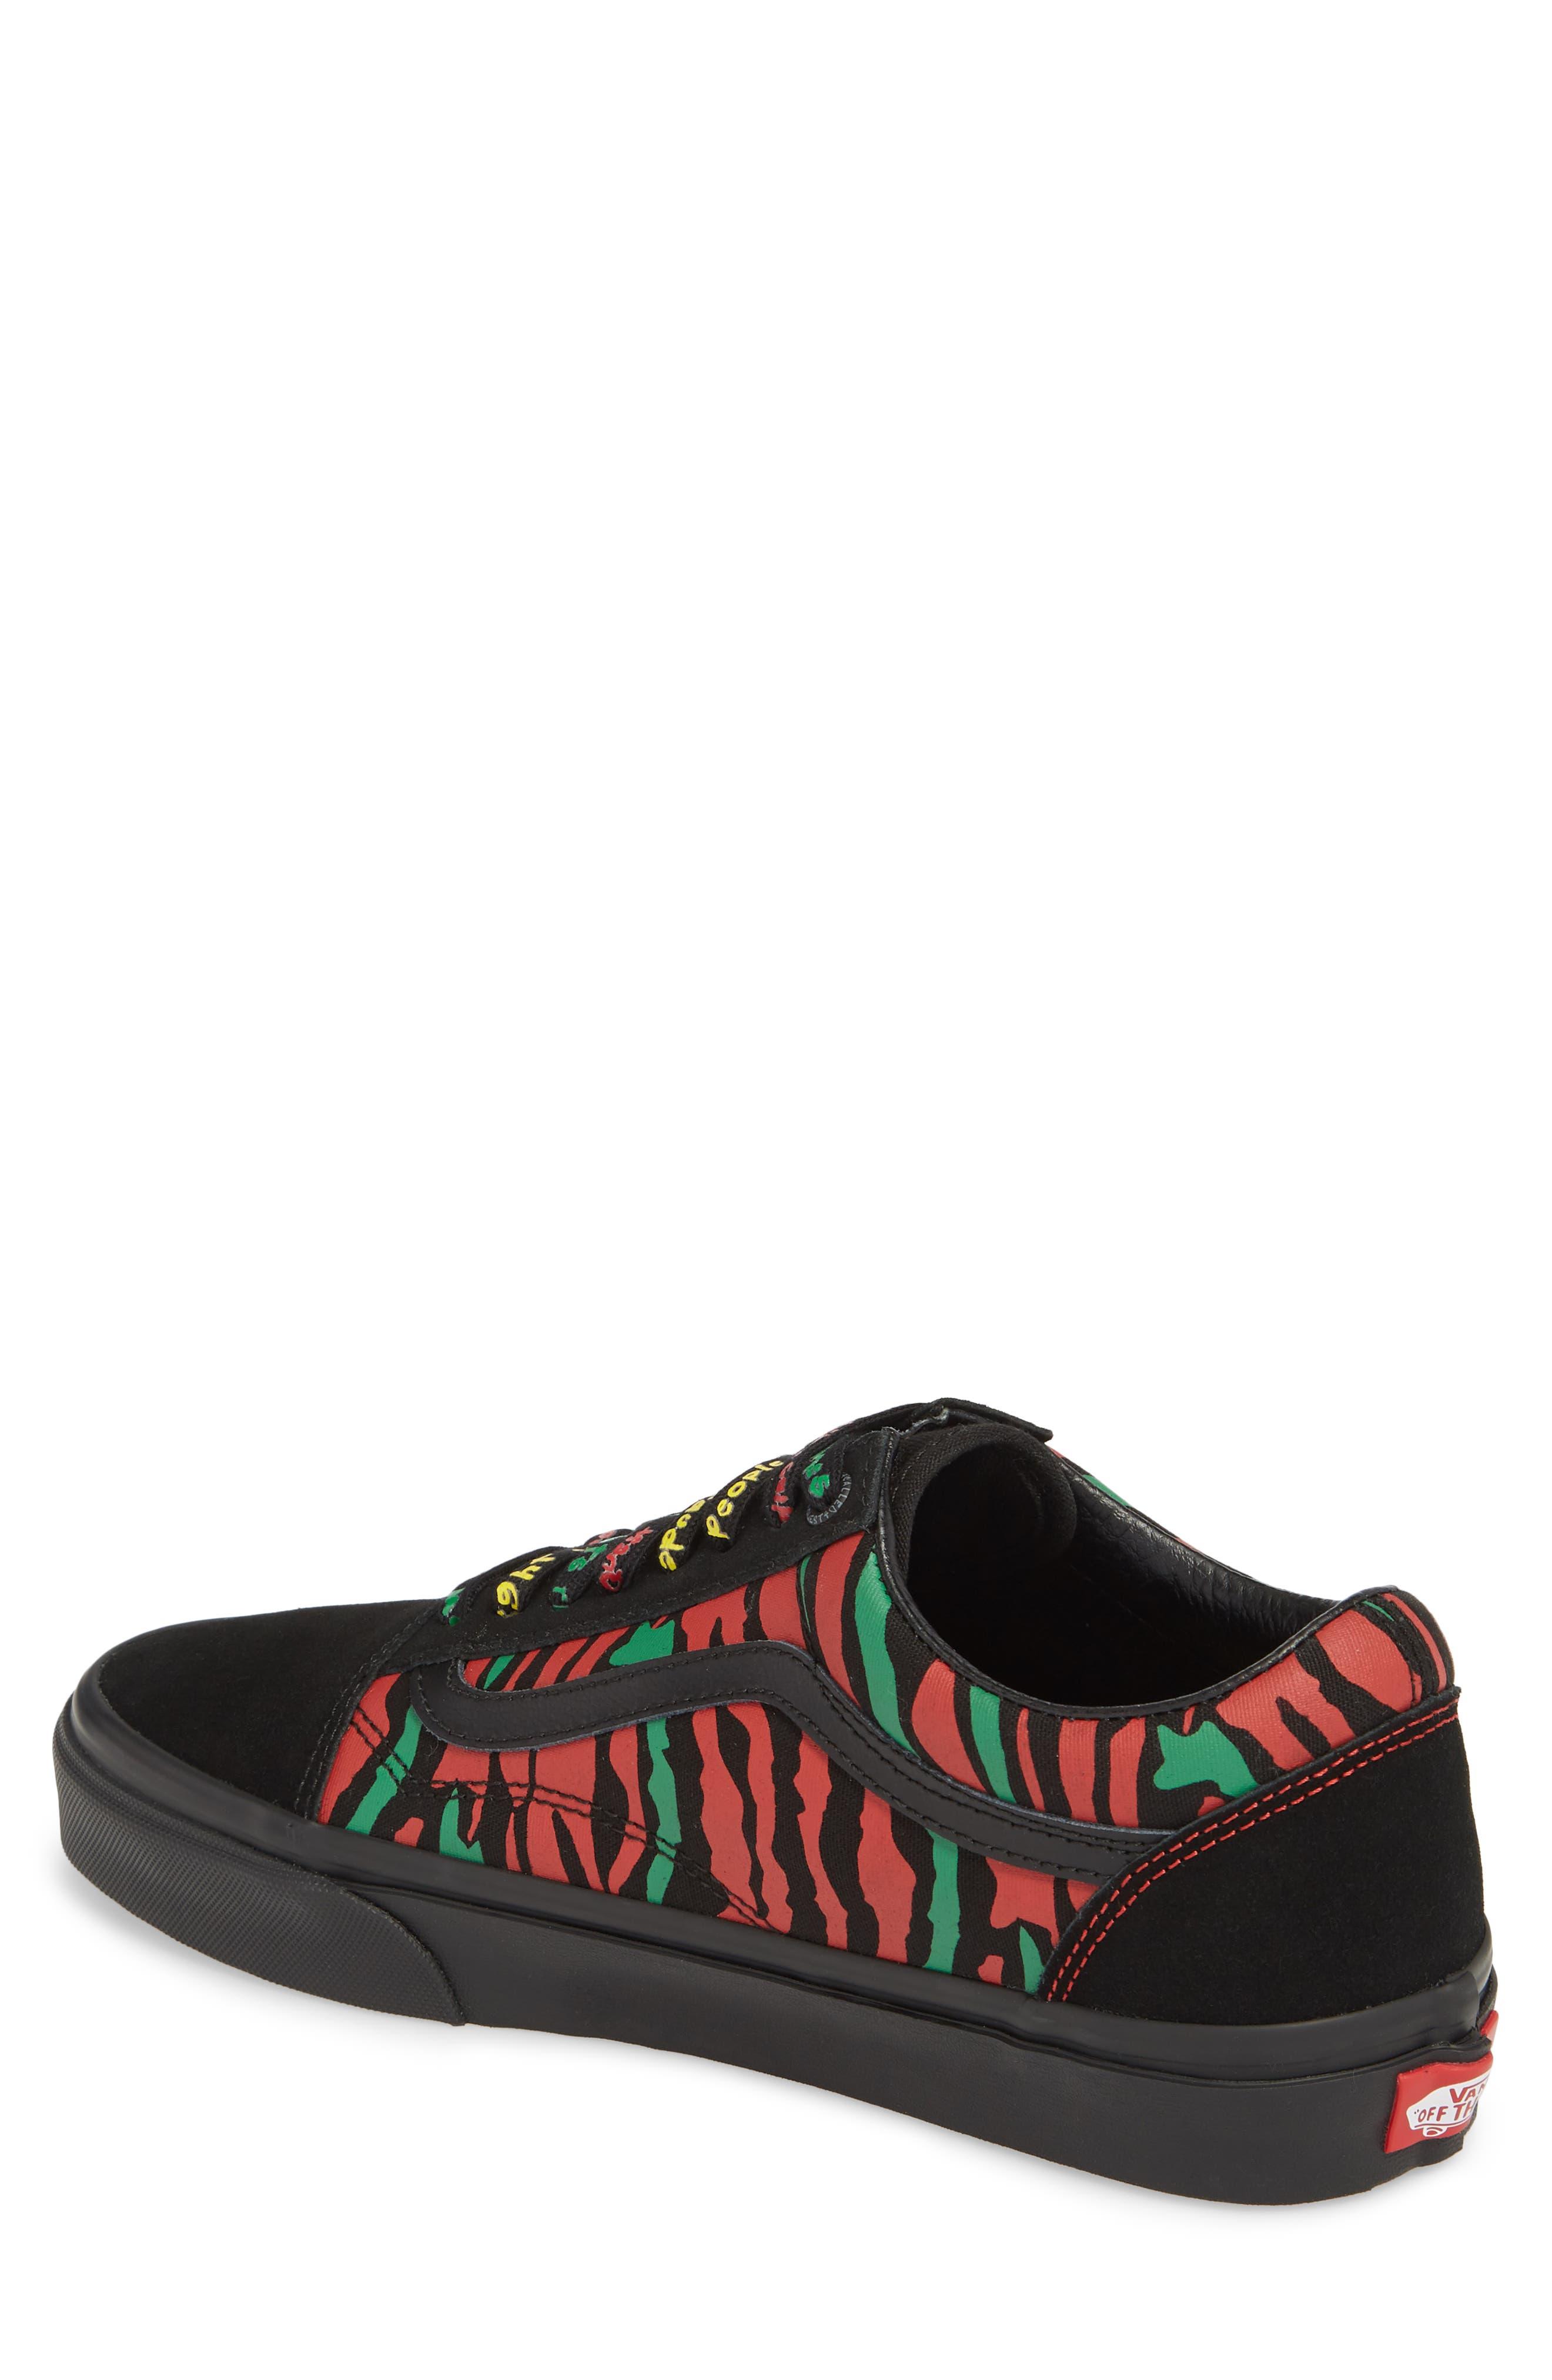 ATCQ Old Skool Sneaker,                             Alternate thumbnail 2, color,                             Black Leather